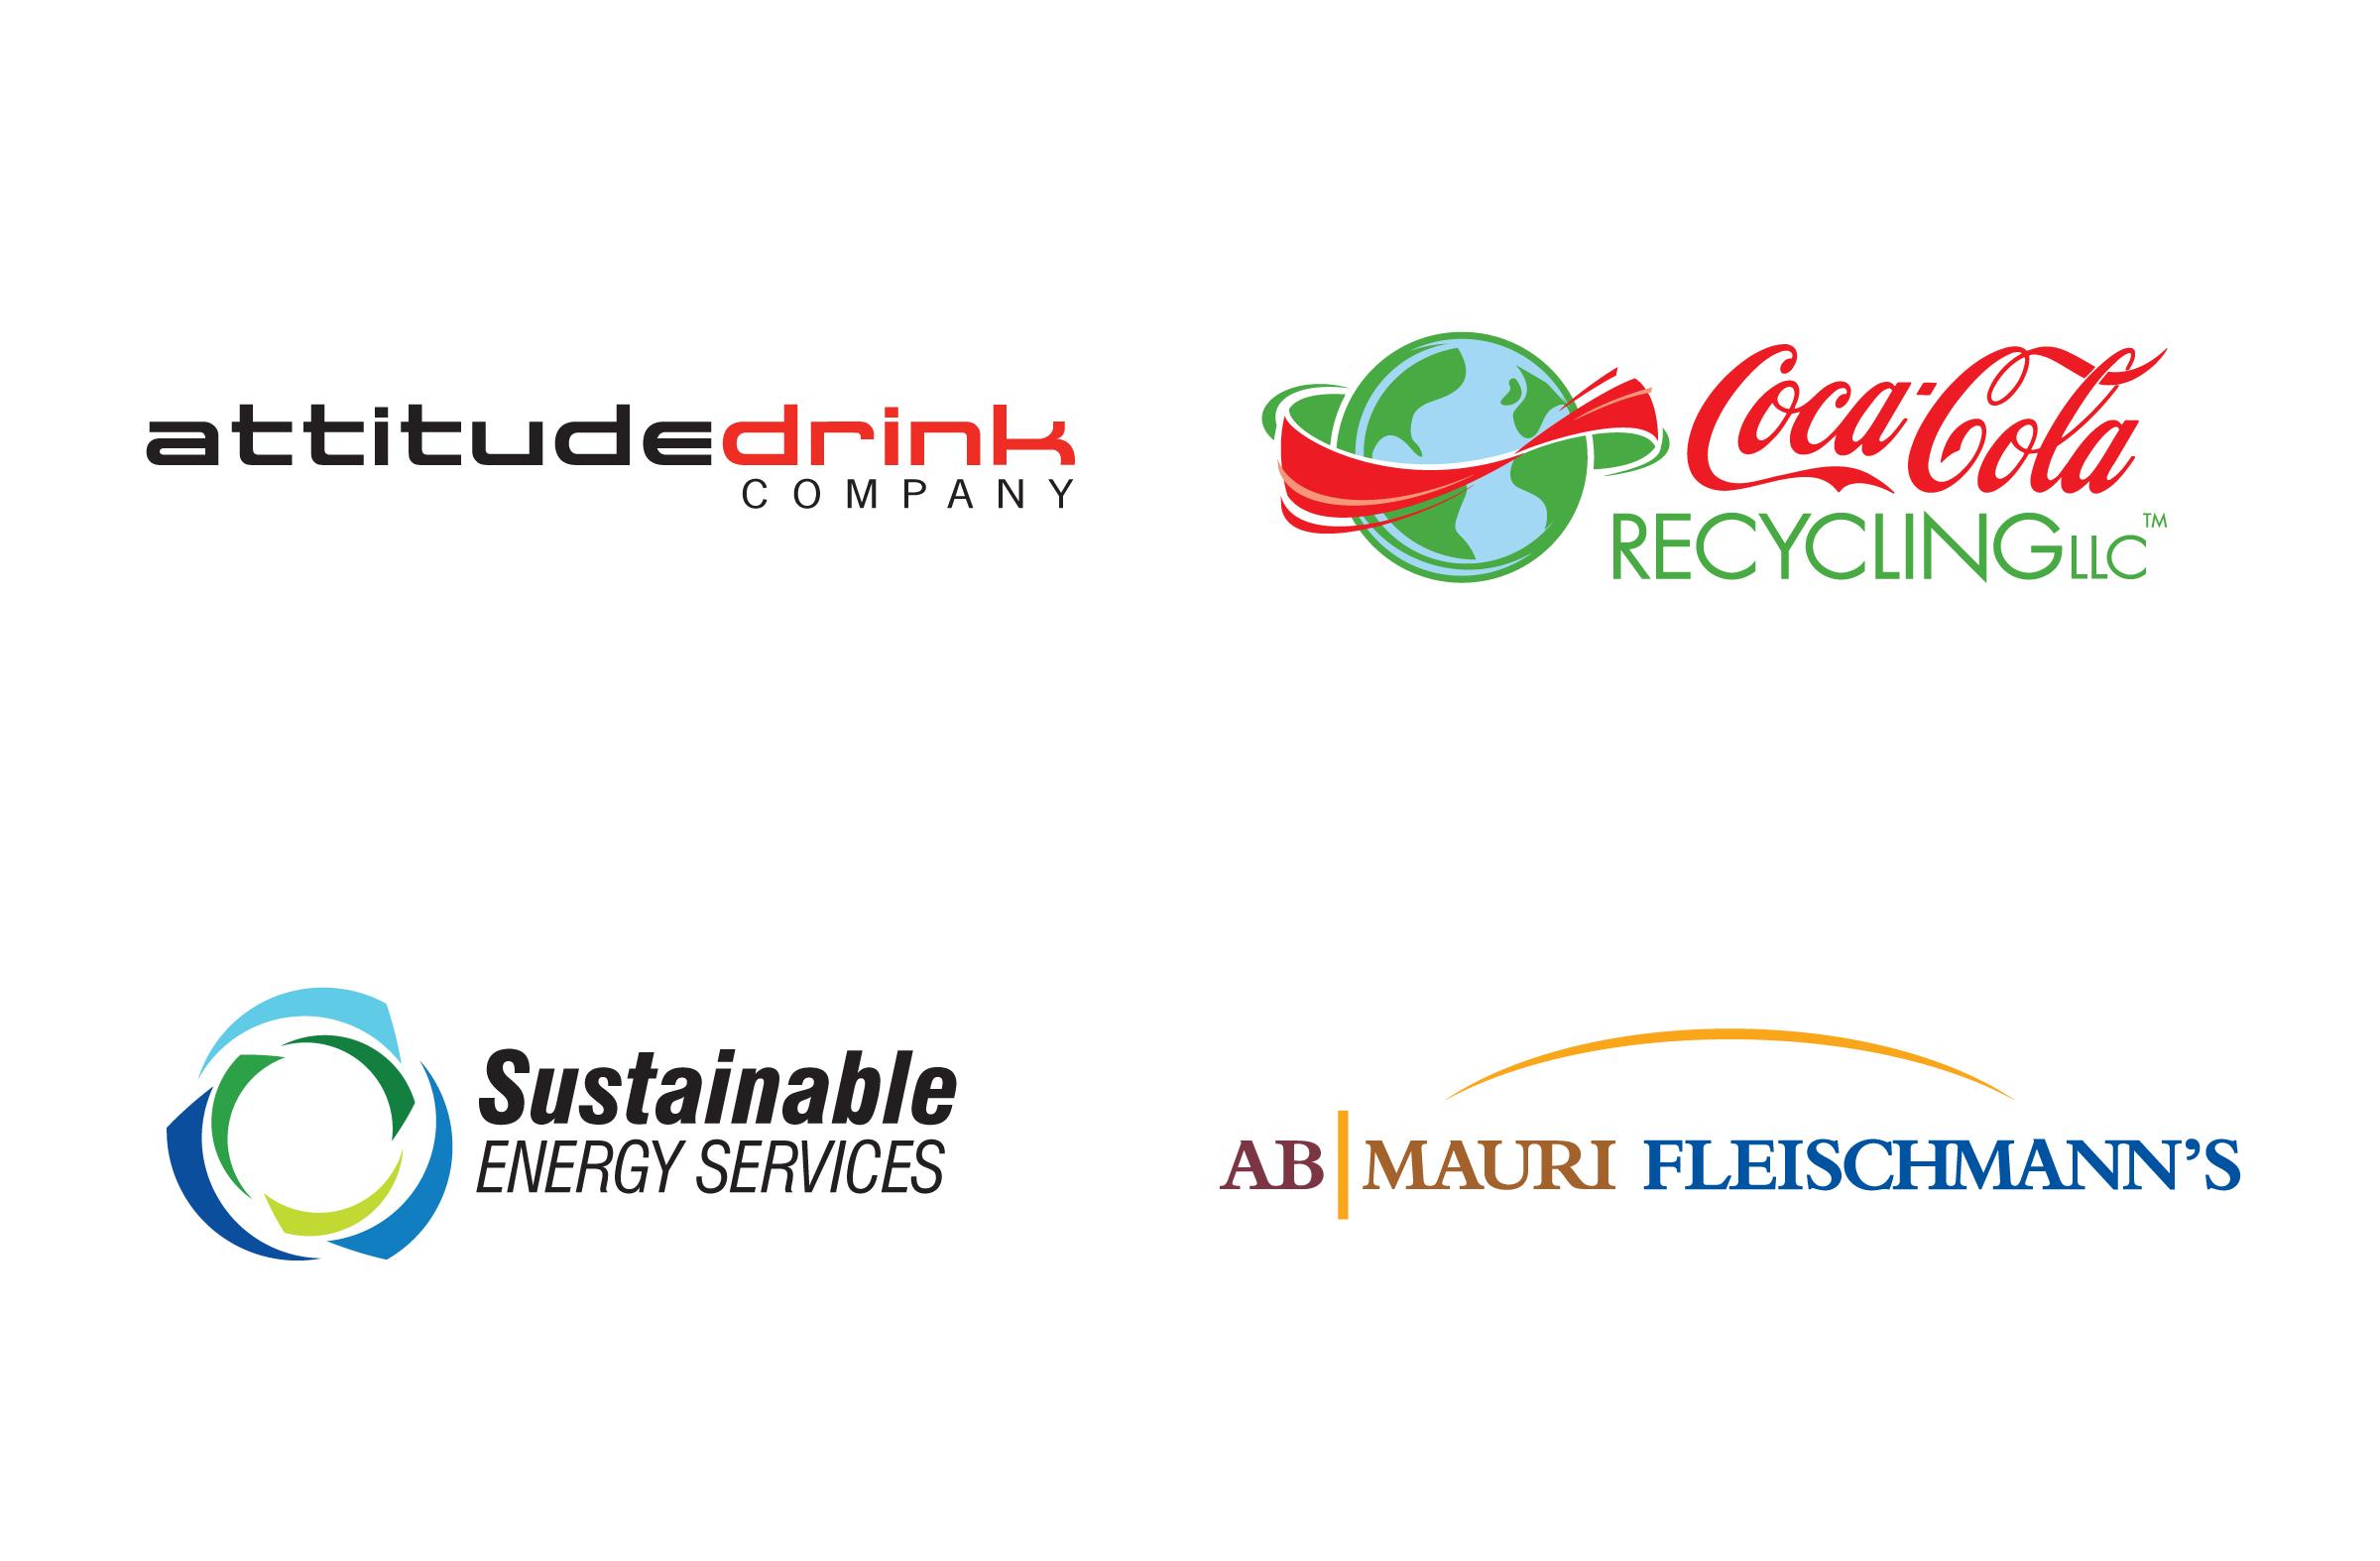 Attitude Cc Recycling Sustainable Energy Ab Mauri Fleishmann S Brand Identity Sustainable Energy Energy Services Brand Identity